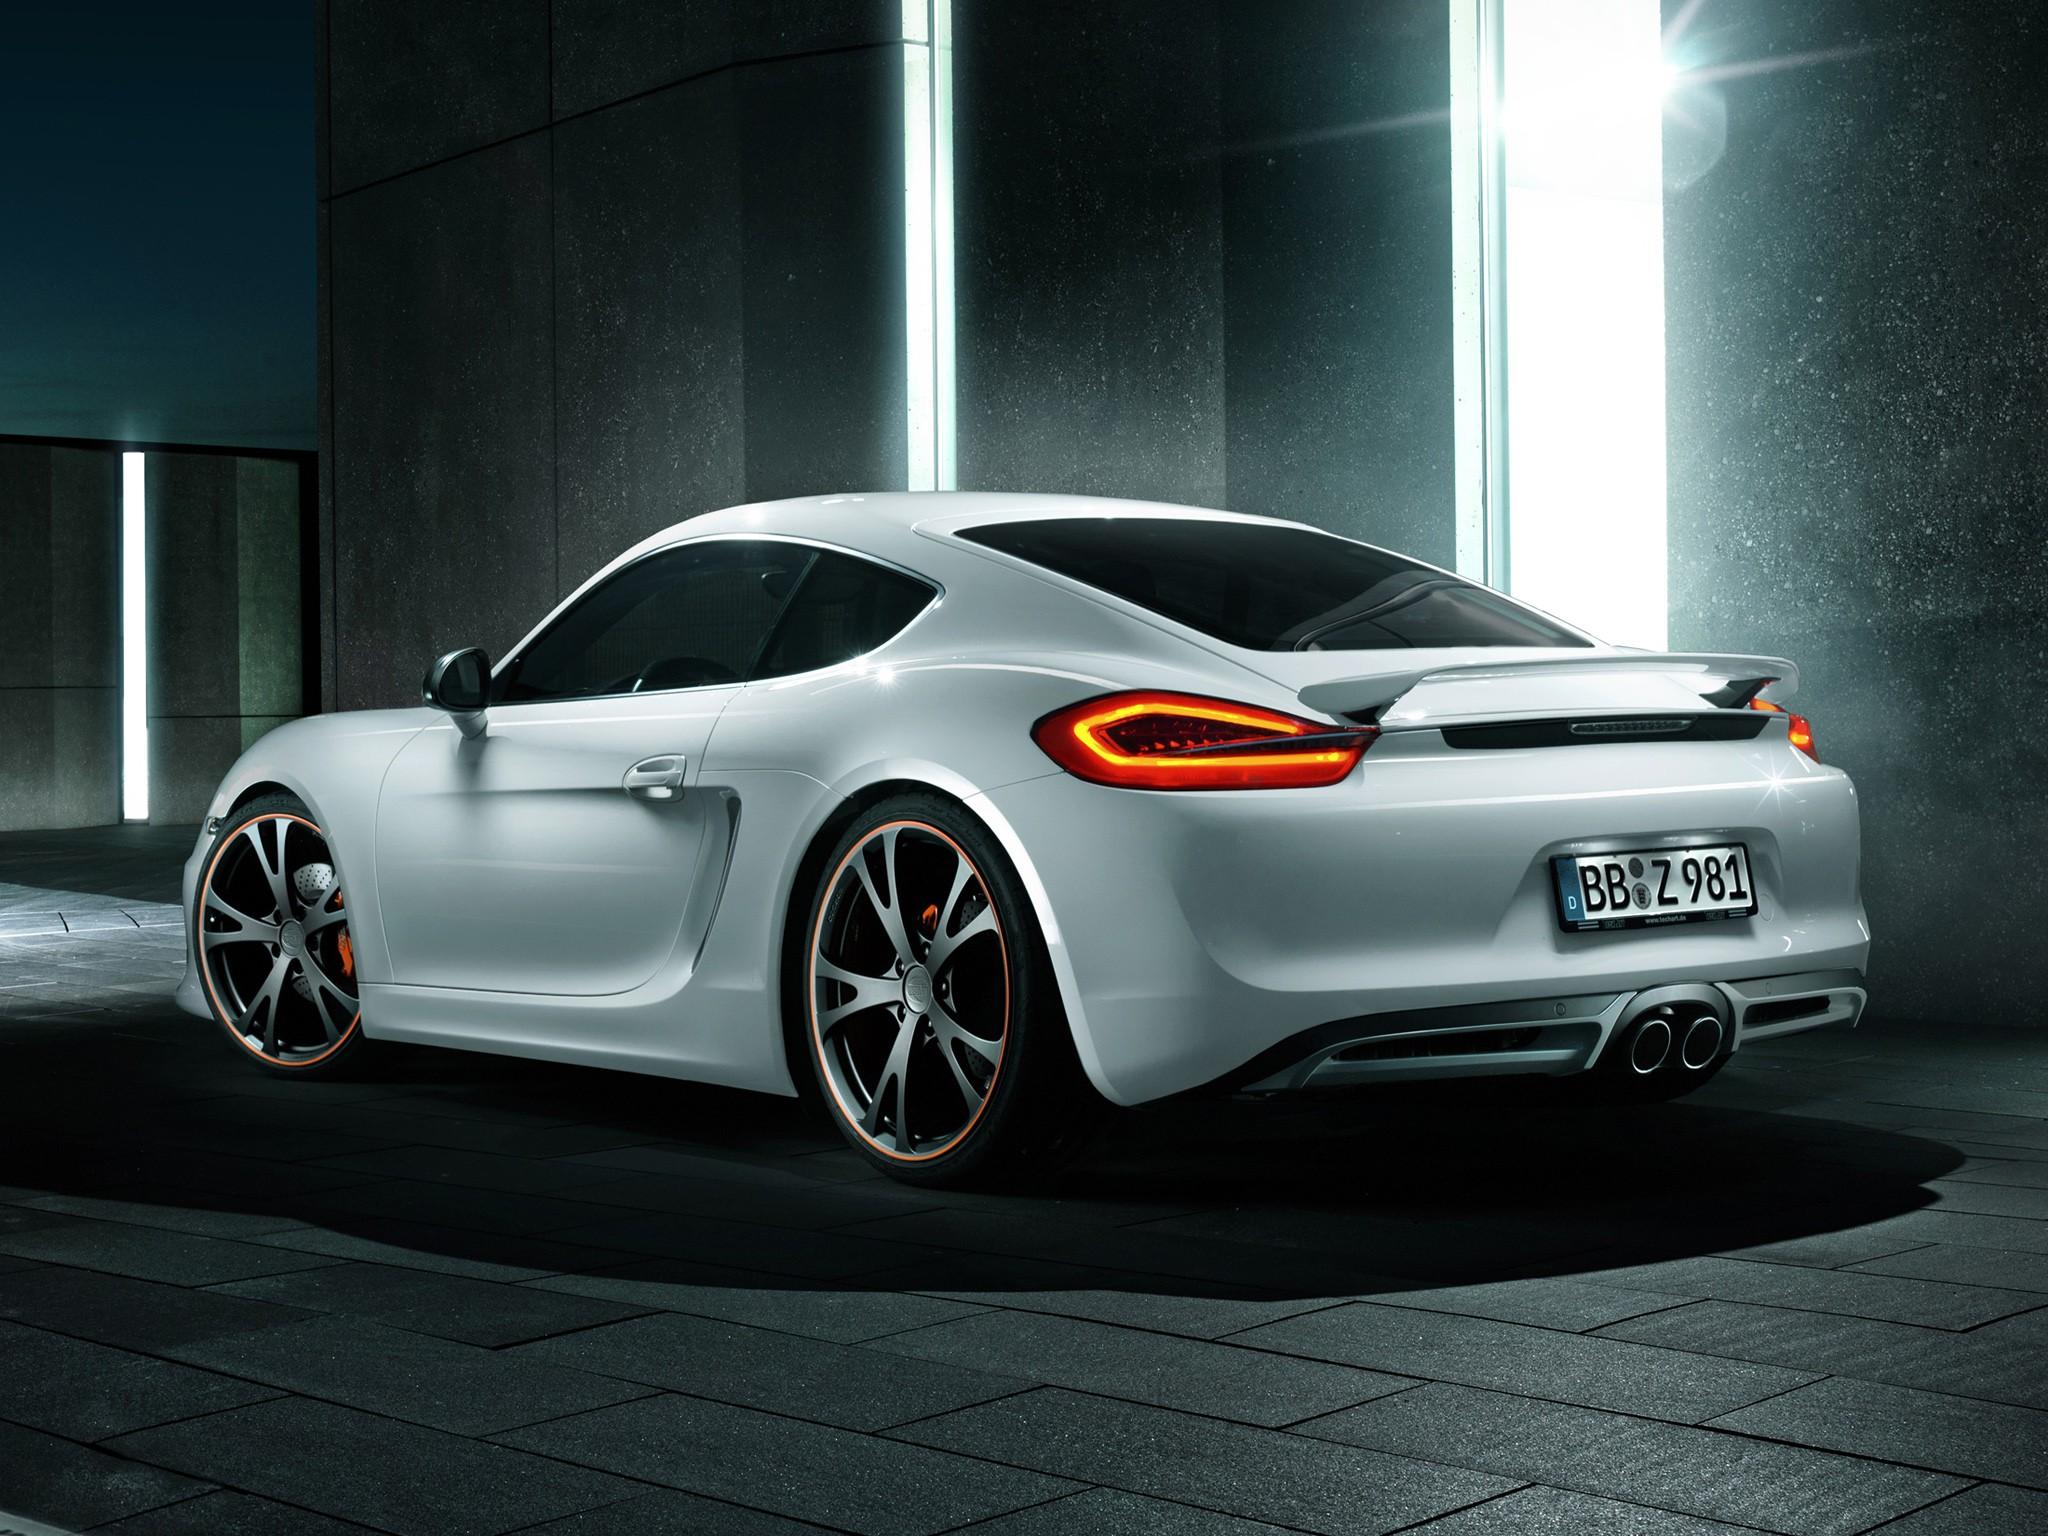 Porsche Boxster Wallpaper Hd Porsche Cayman 981 Specs Amp Photos 2012 2013 2014